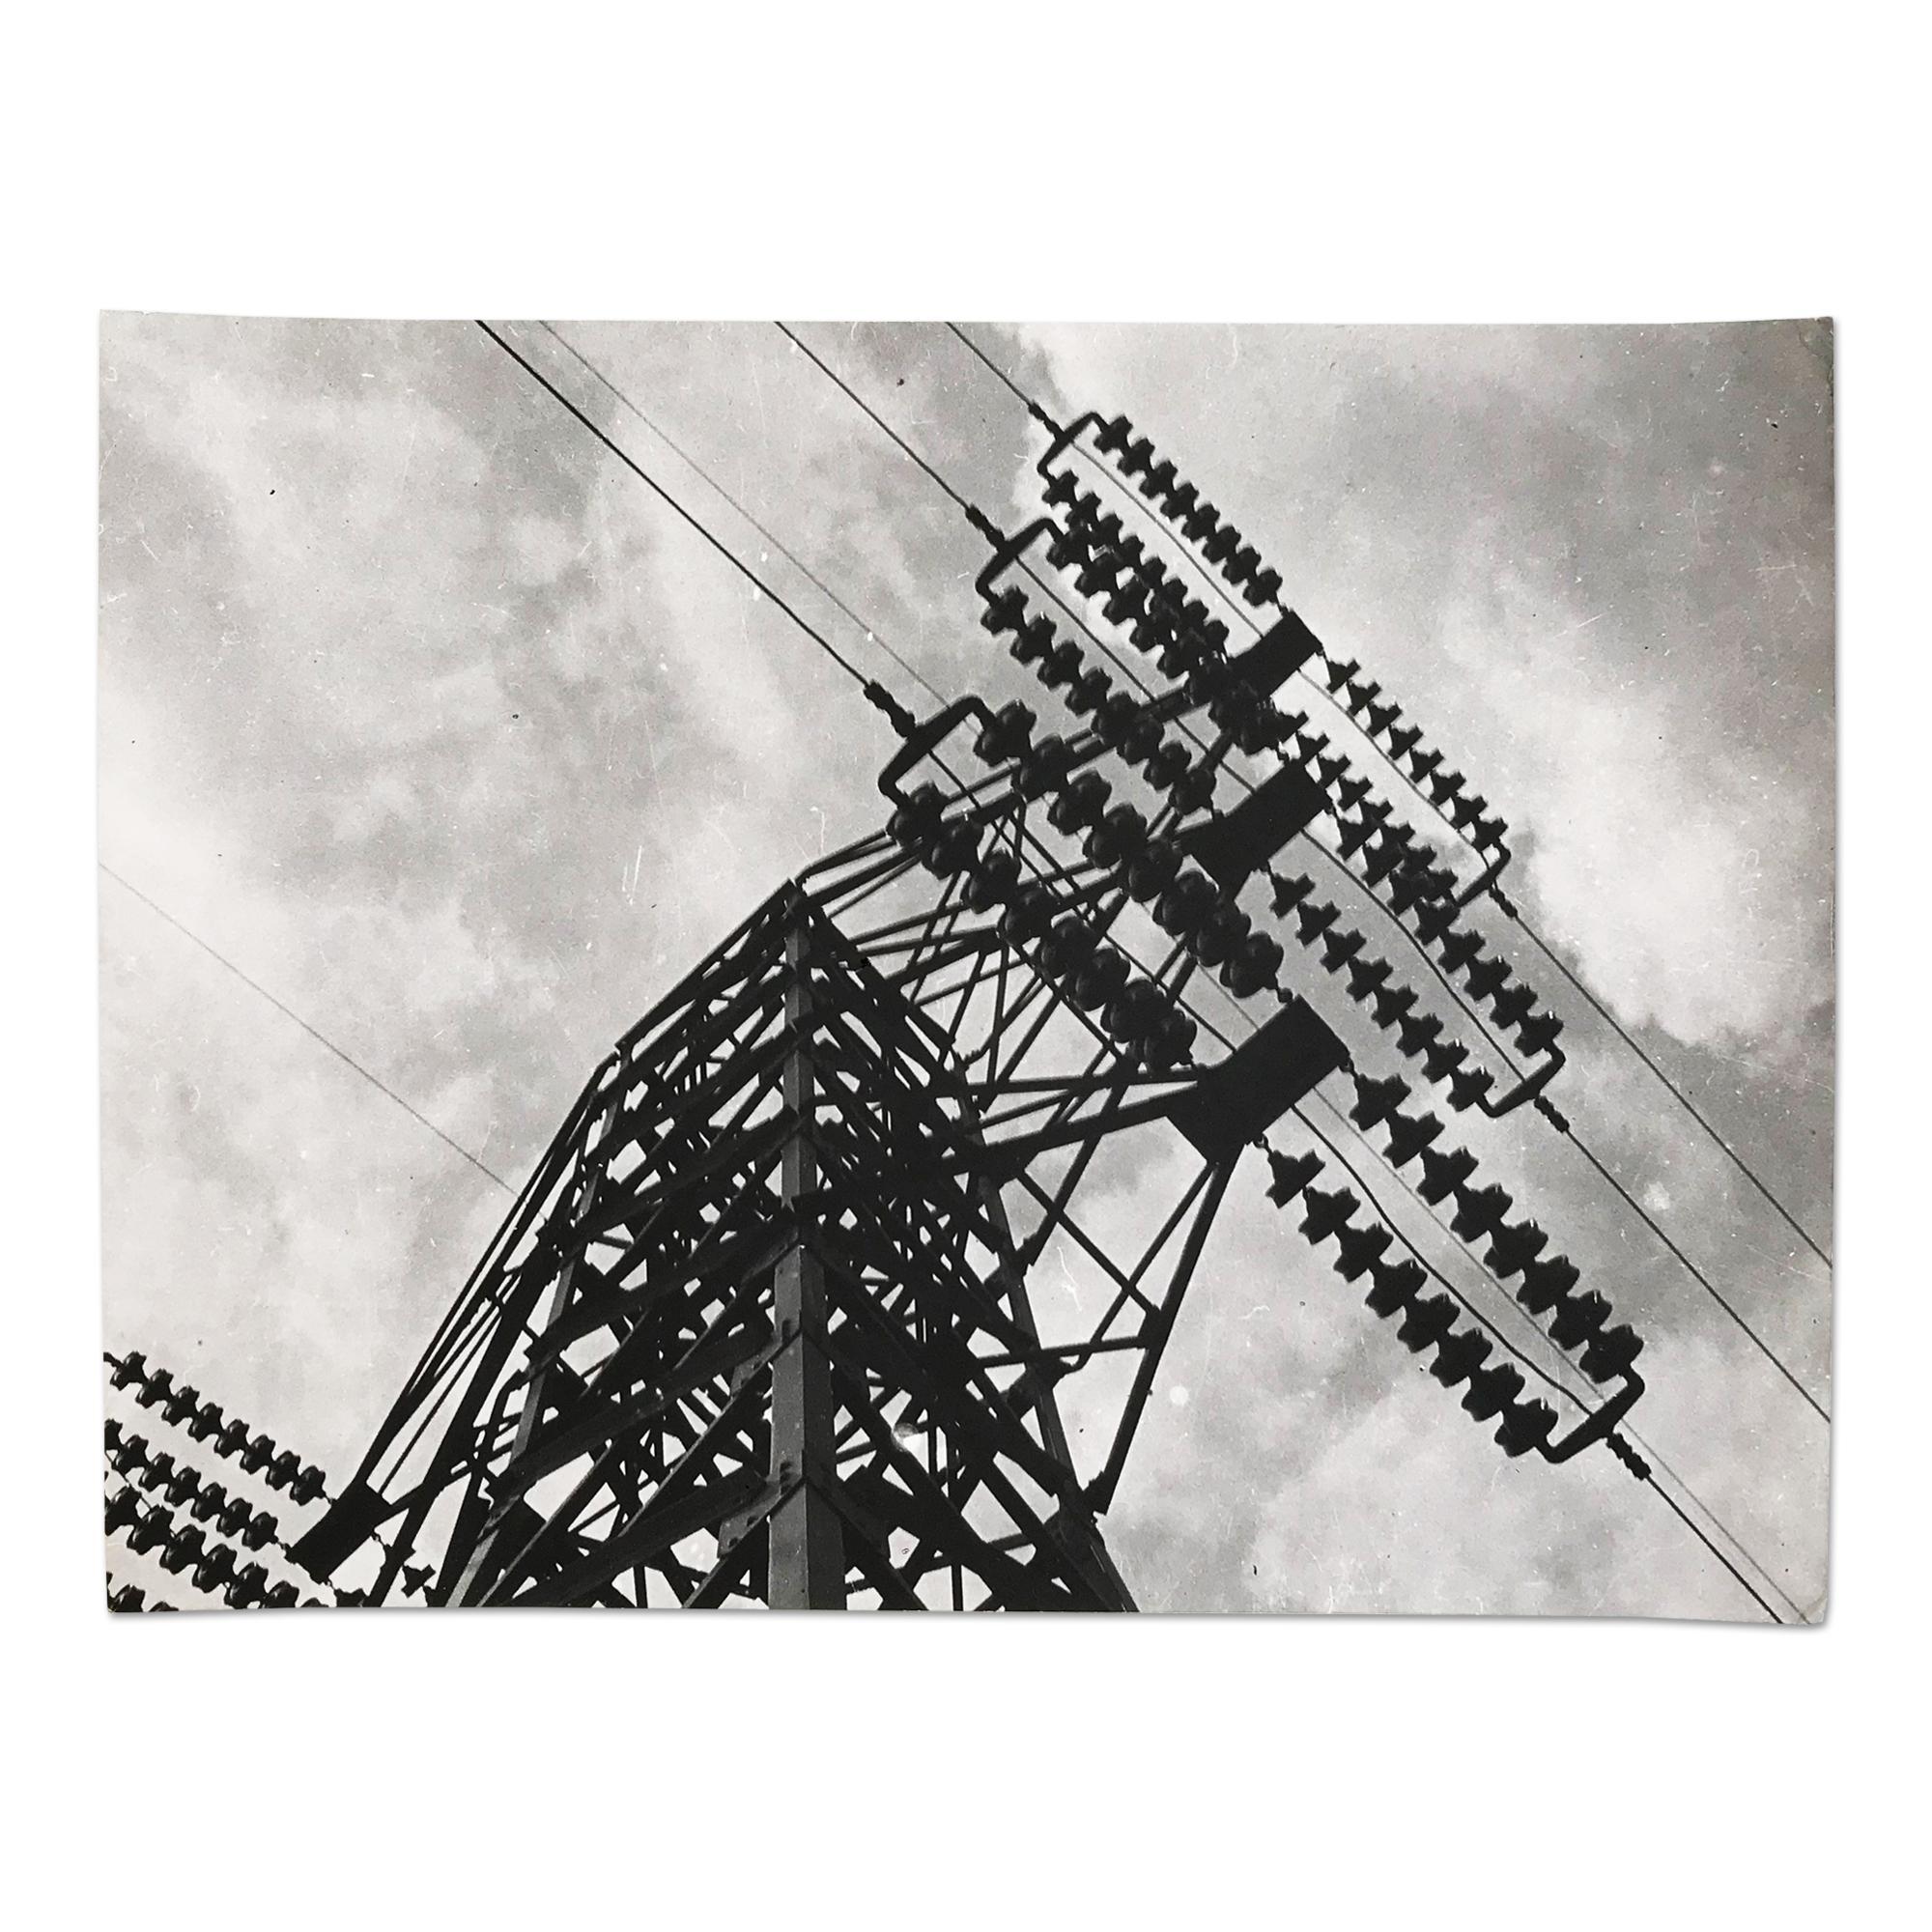 Pylon, Silver Gelatin Print, Constructivism, Modern Art, 20th Century